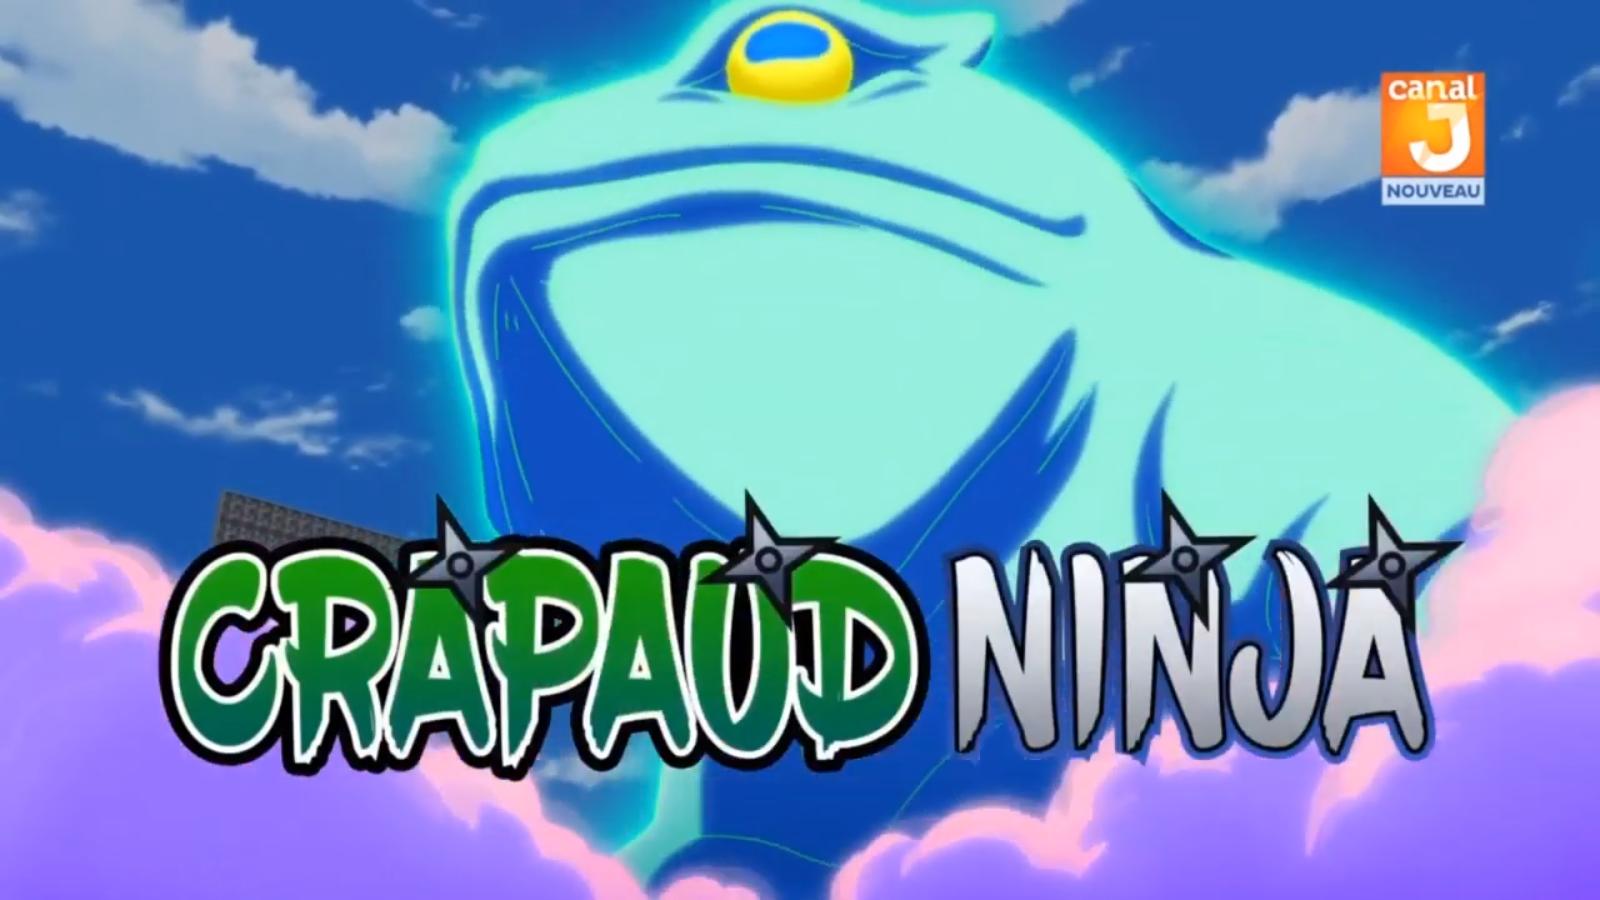 Crapaud Ninja